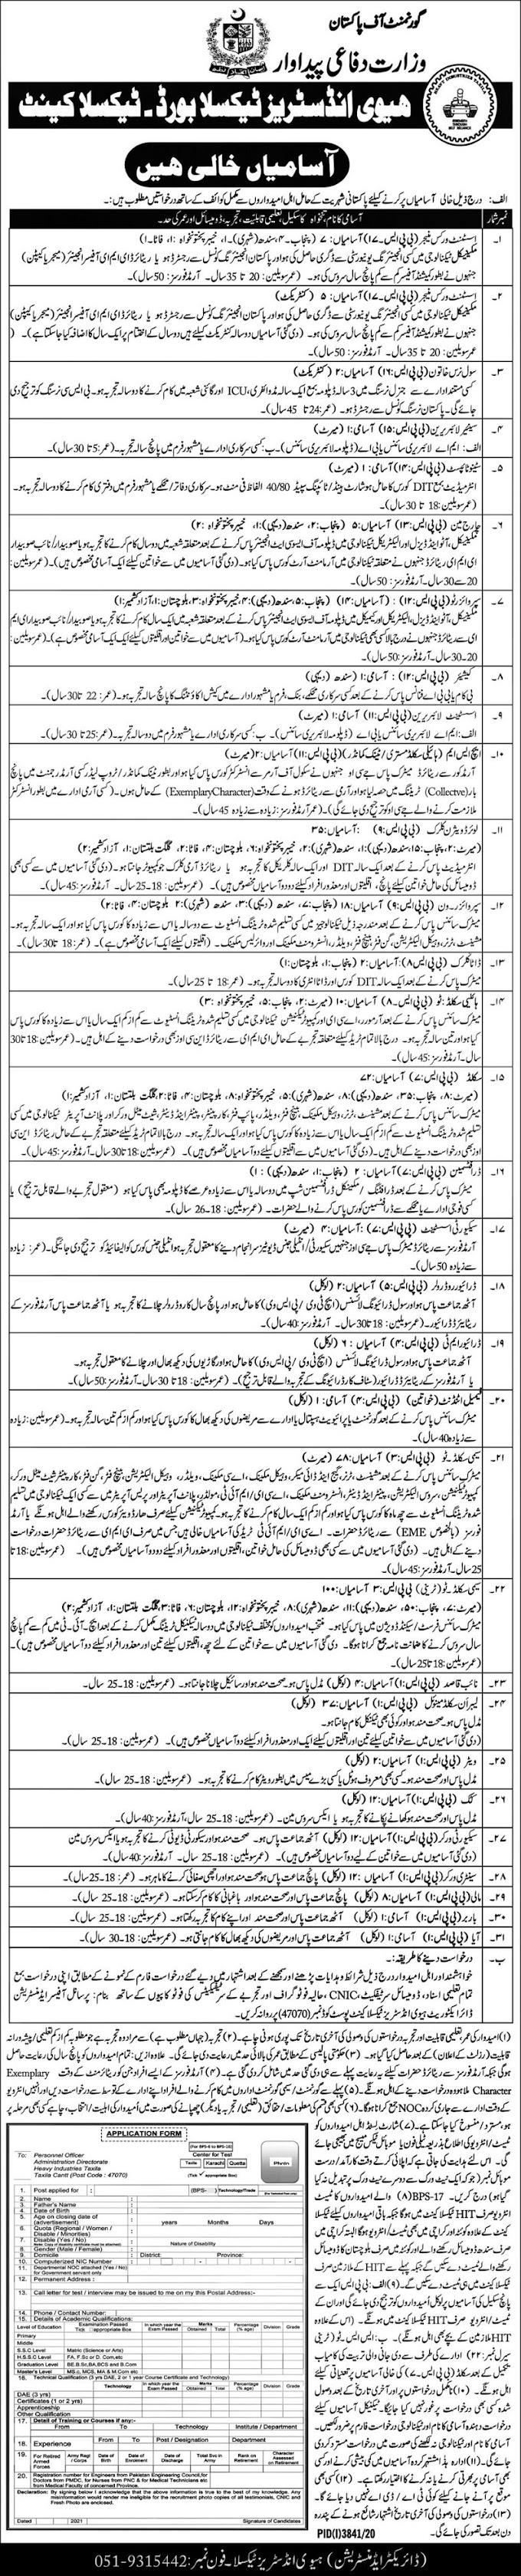 Heavy Industries Taxila Board Taxila Cantt Jobs 2021